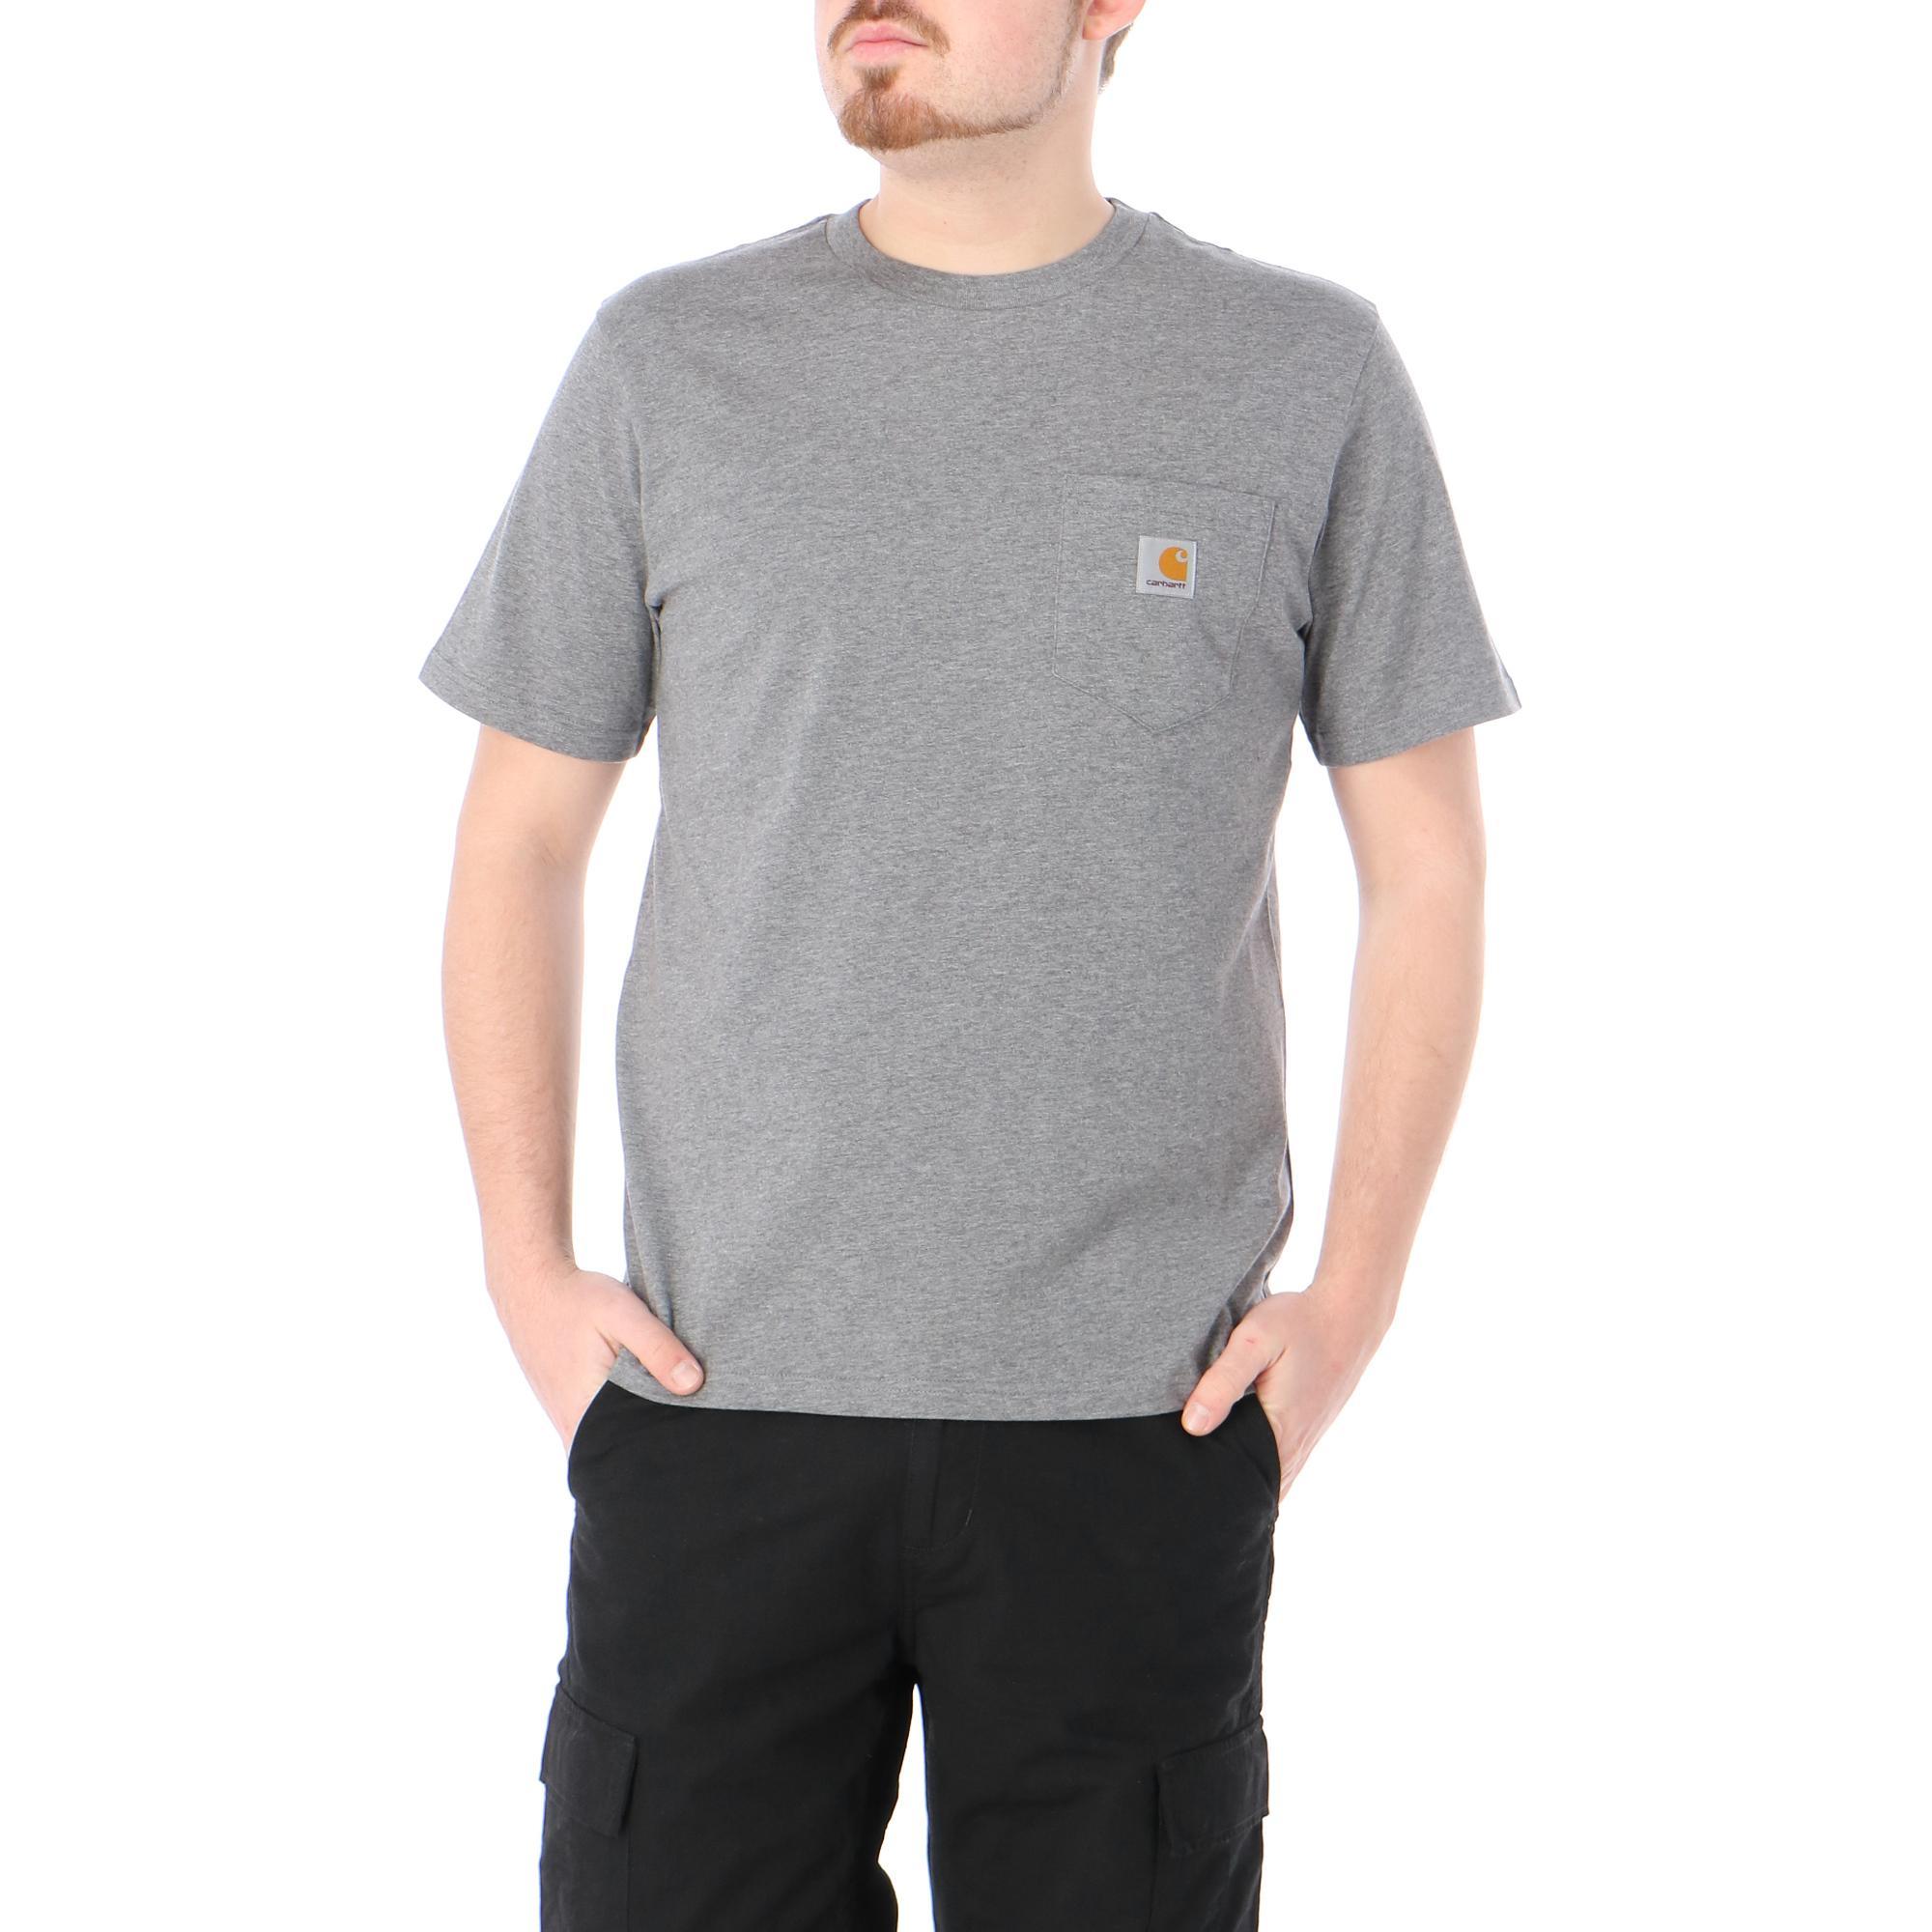 Carhartt S/s Pocket T-shirt Dark grey heather